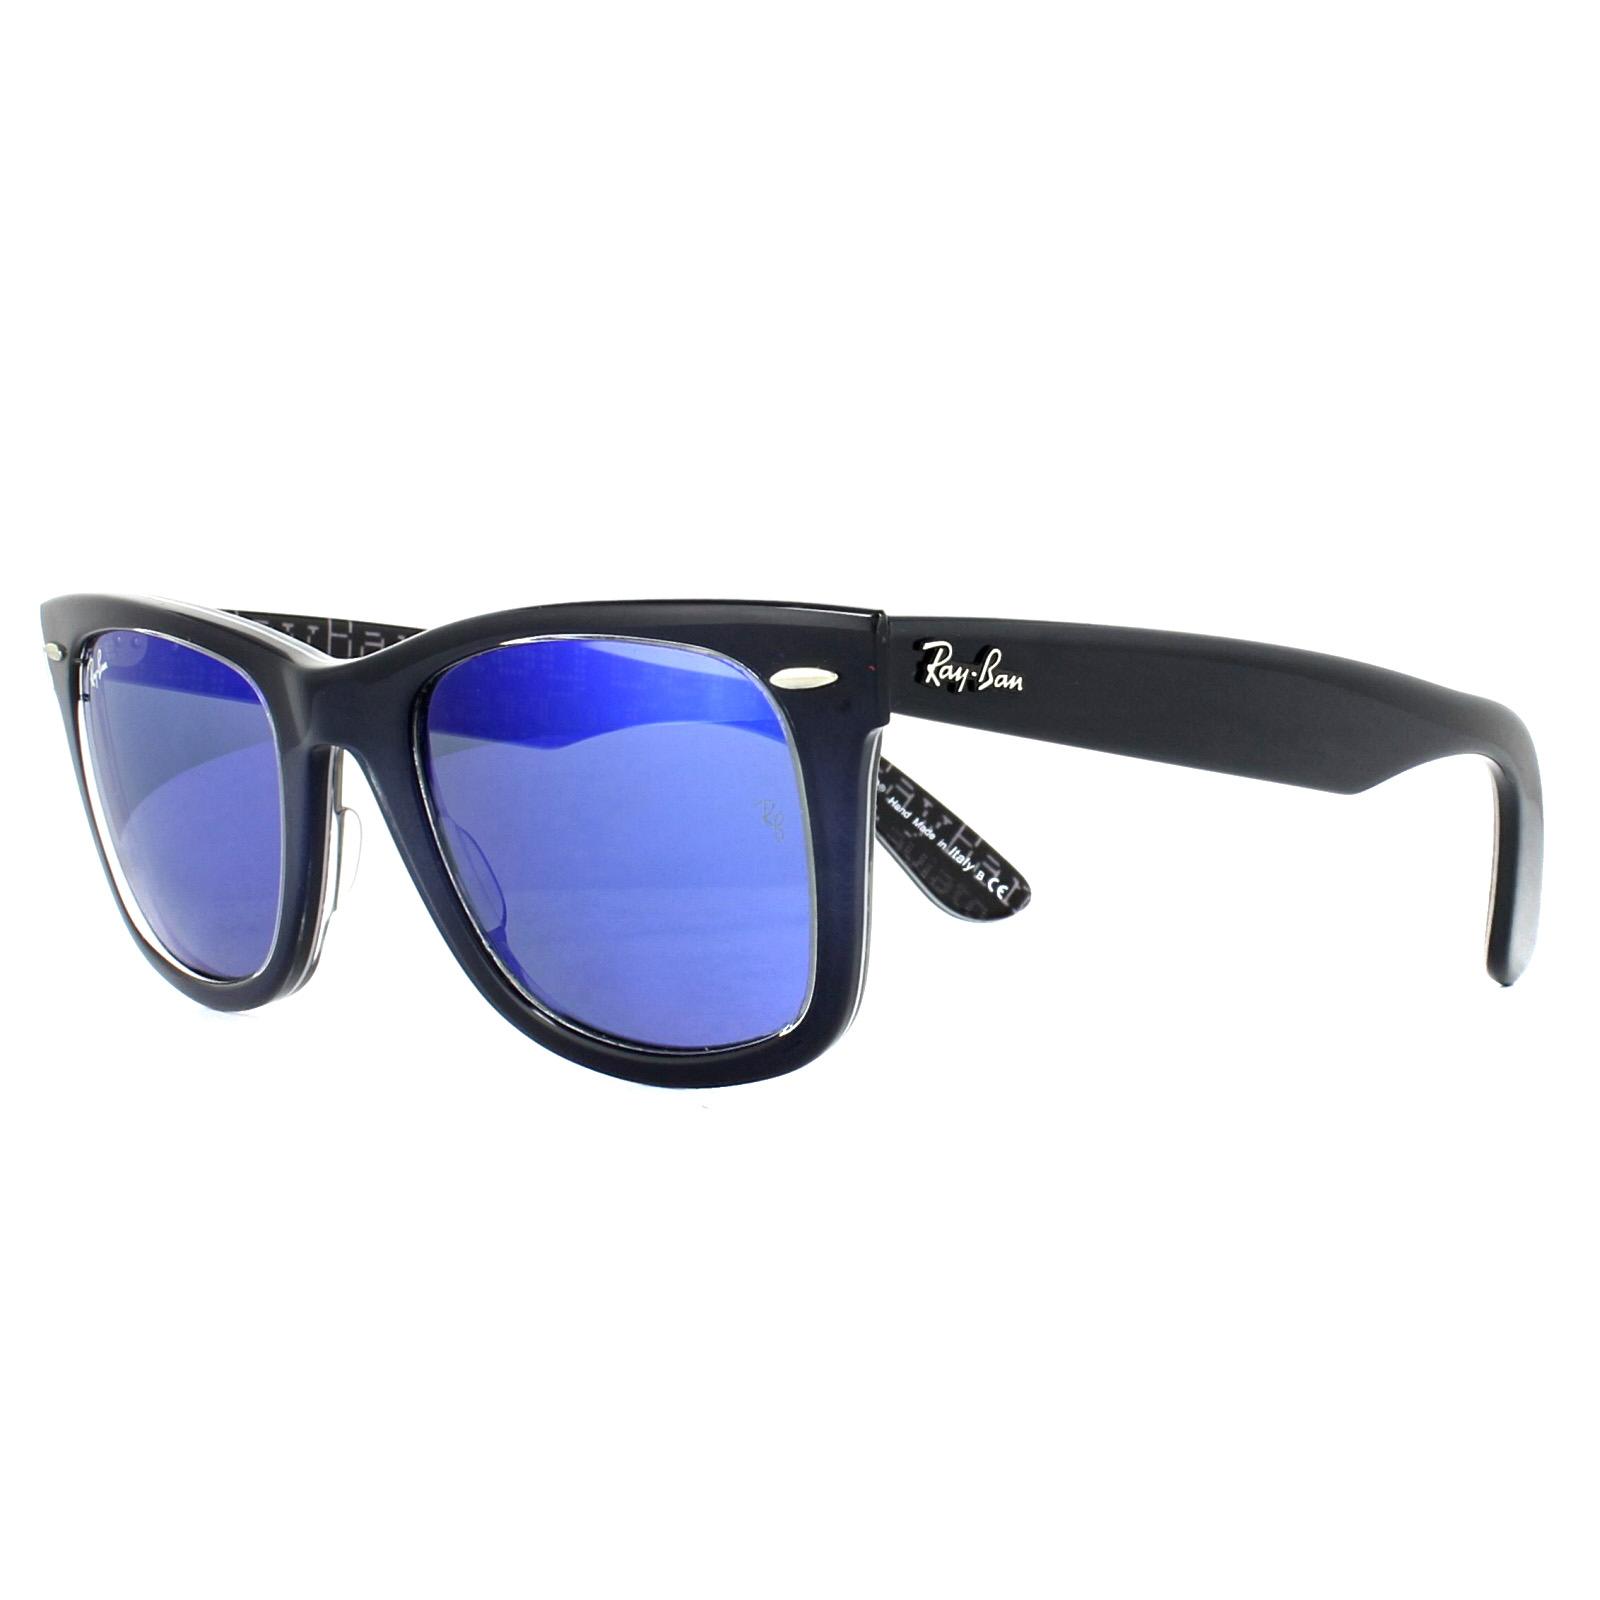 1930301f2e CENTINELA Gafas de sol Ray-Ban Wayfarer 2140 120368 píxel azul oscuro texto  azul espejo 50mm